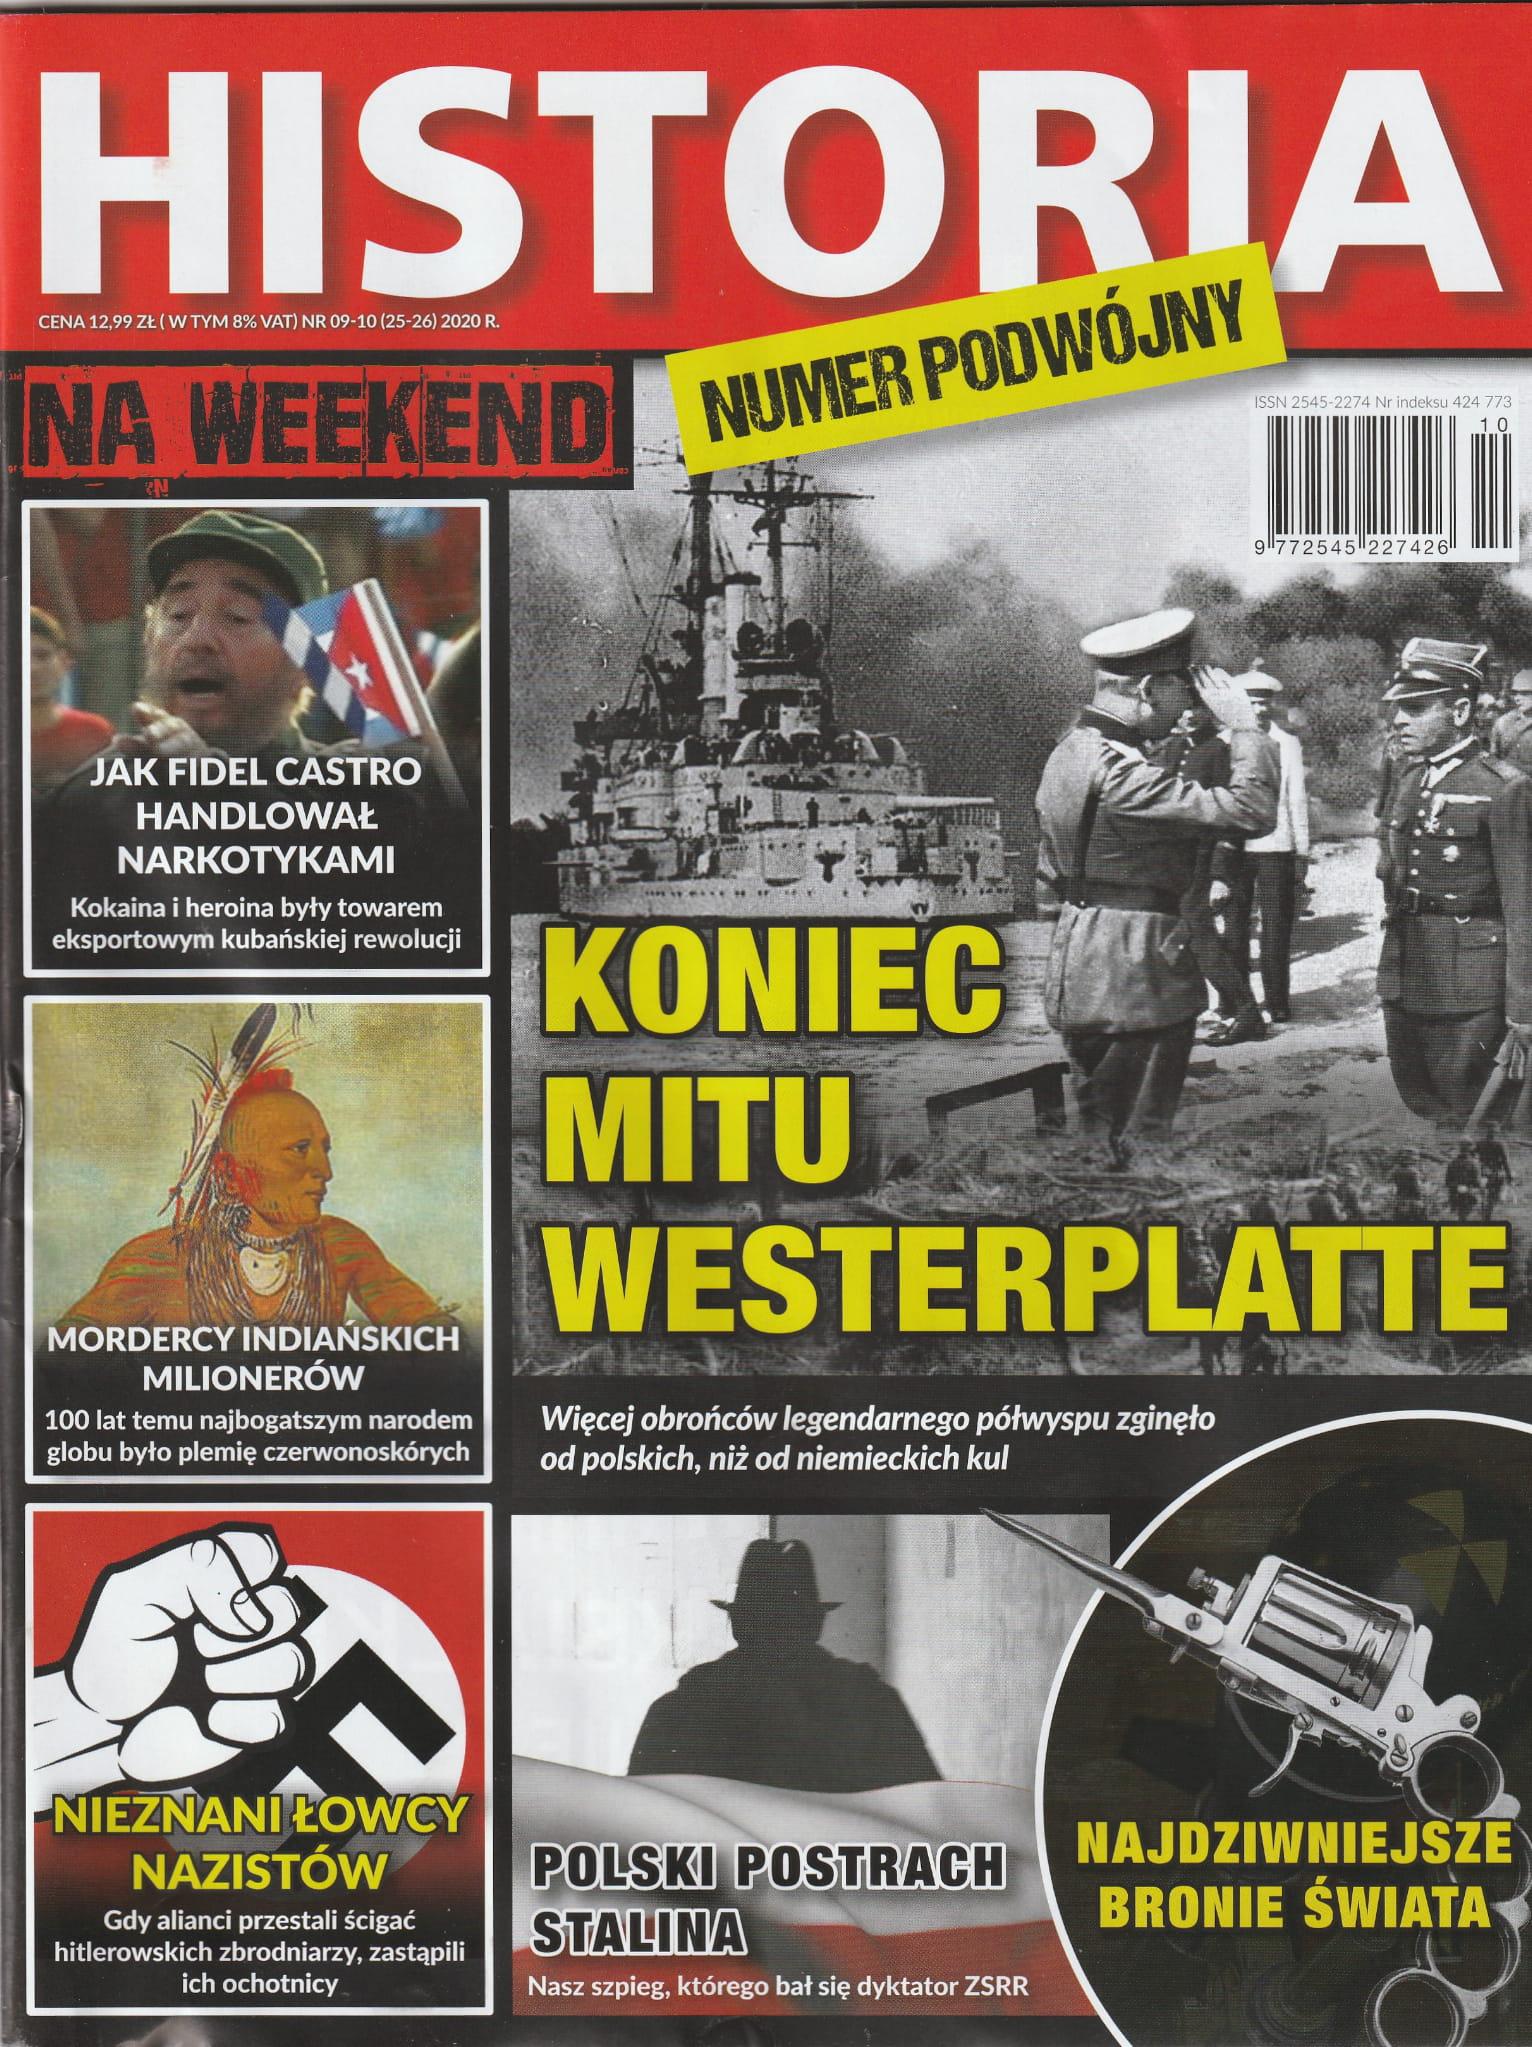 Historia na weekend nr 09-10 (25-26) 2020 r.